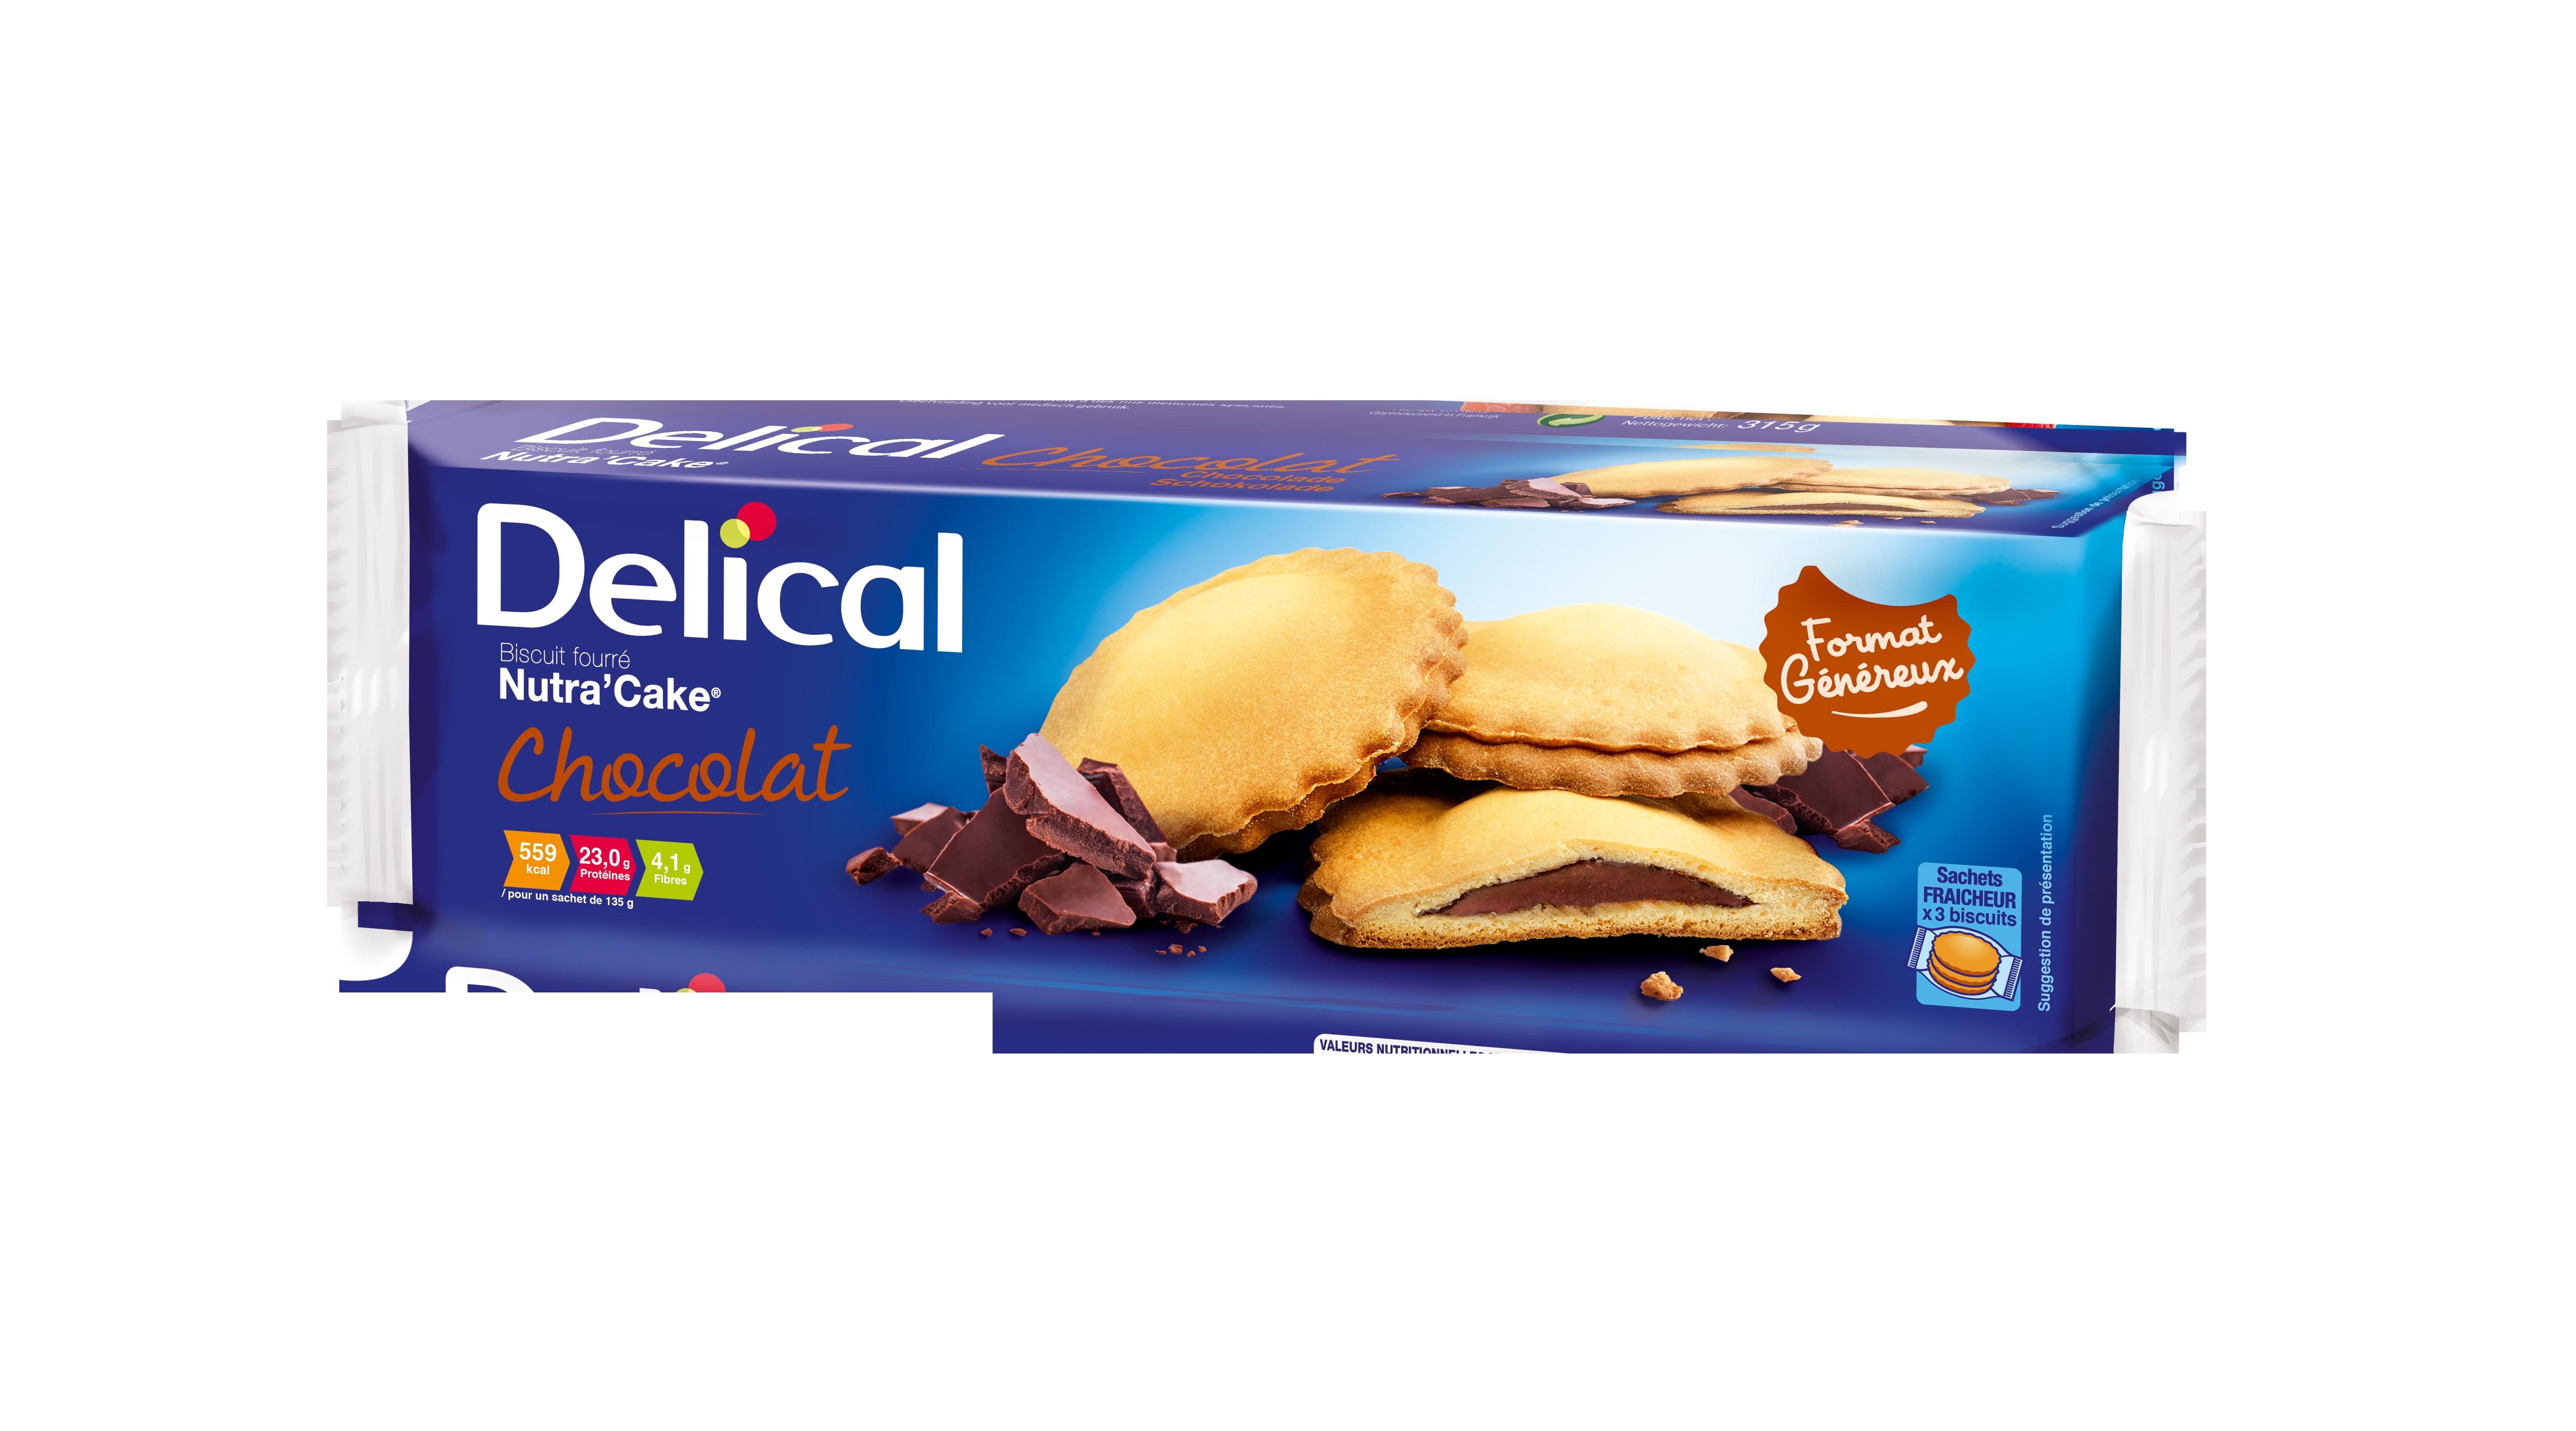 DELICAL Nutra'Cake Chocolat